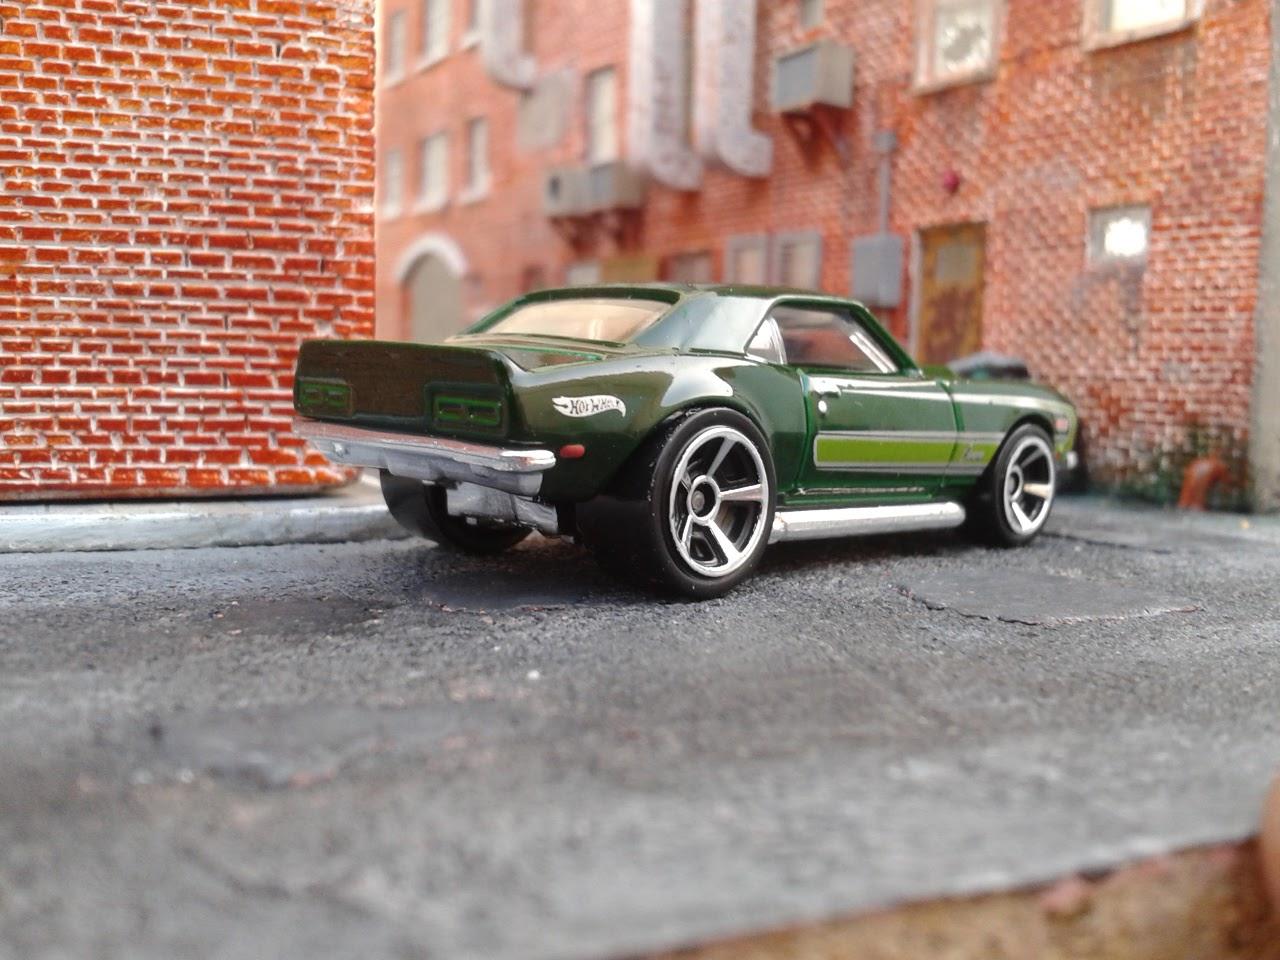 diecast cars habitat copo camaro 1968. Cars Review. Best American Auto & Cars Review